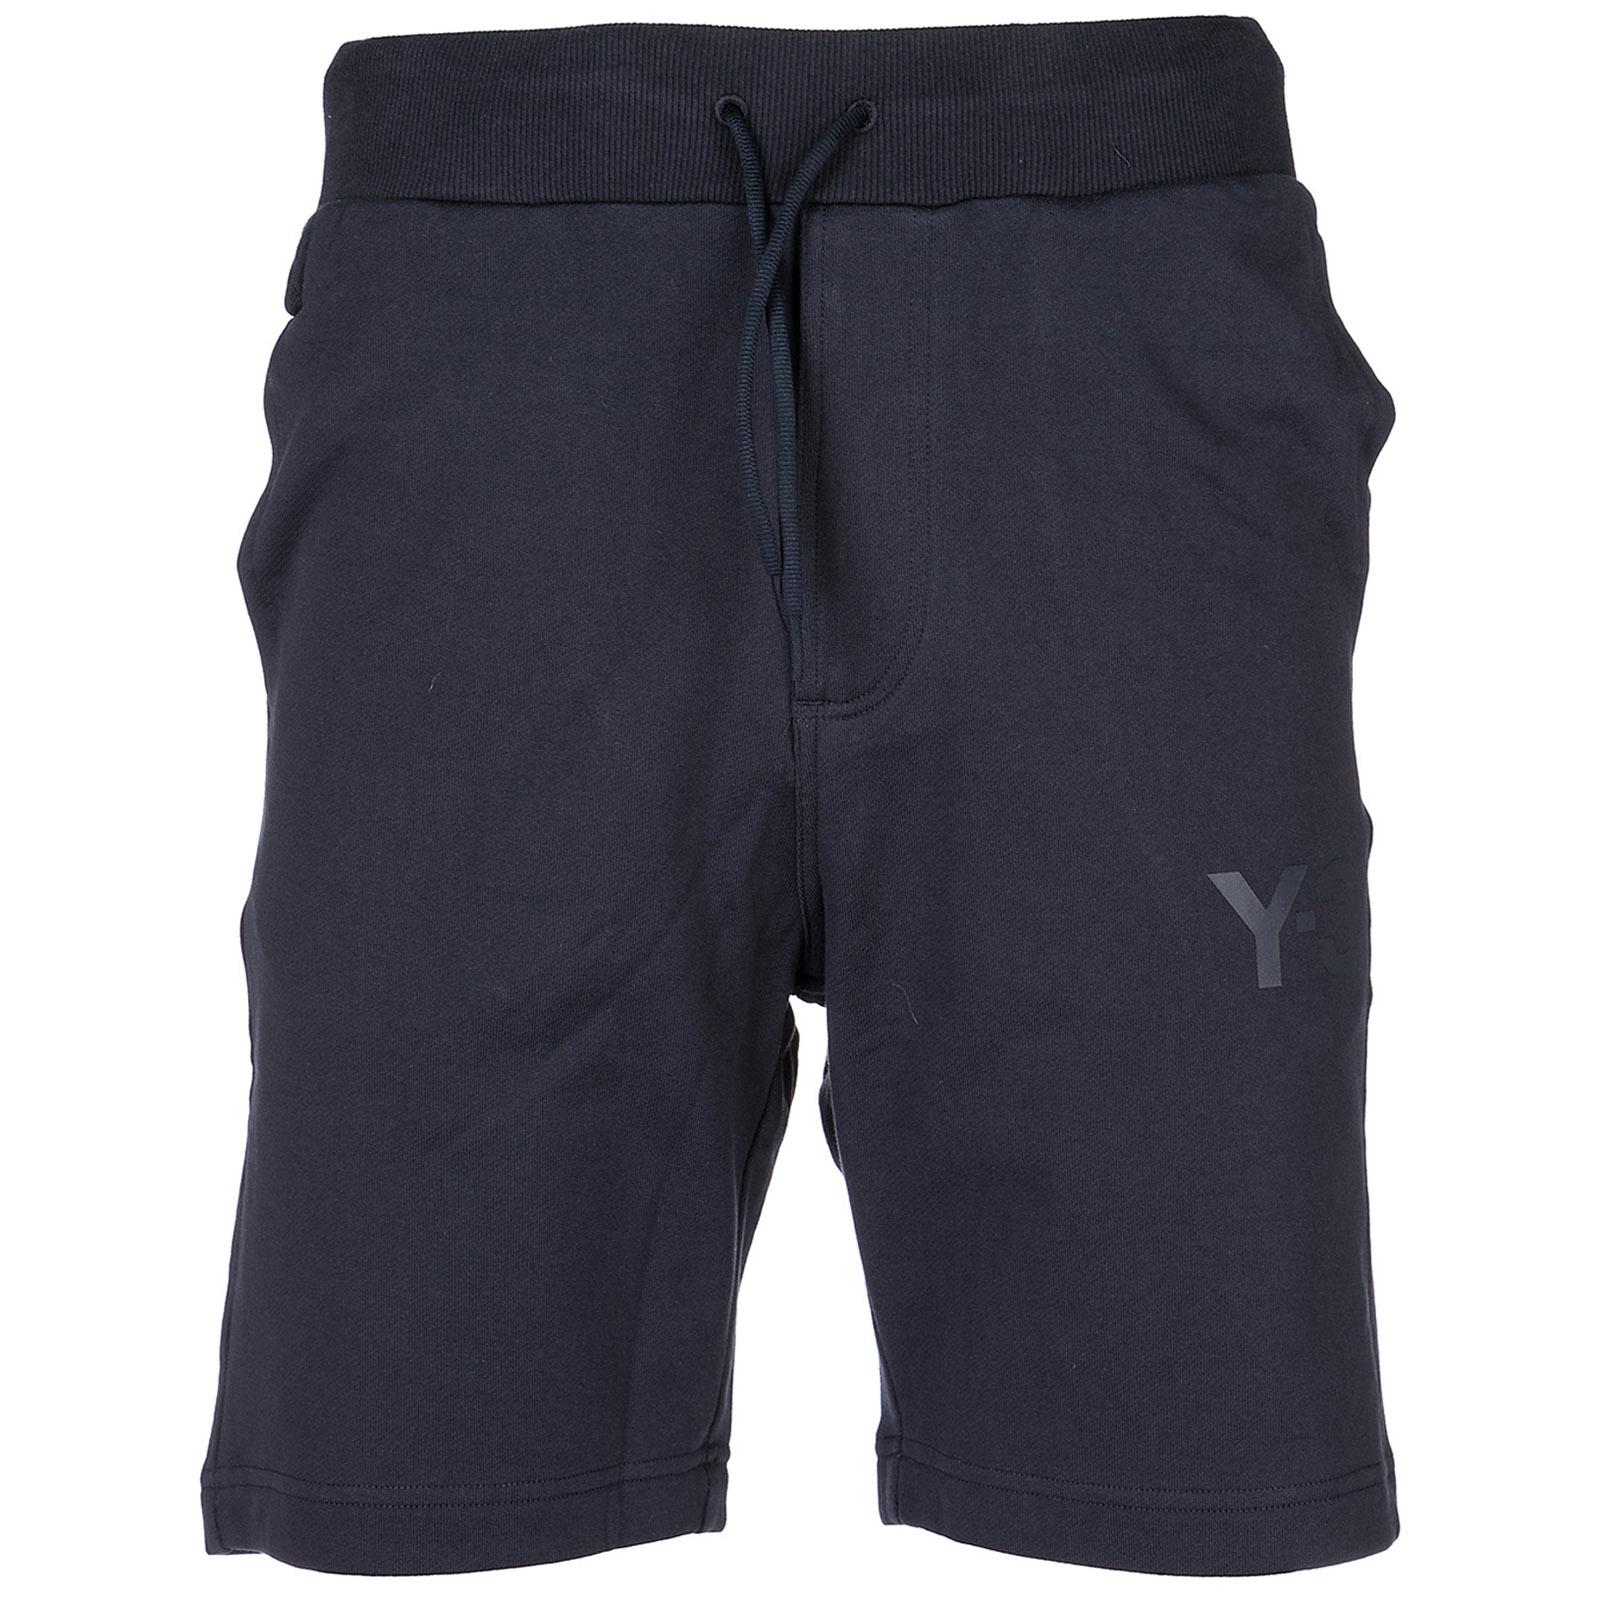 Bermuda shorts pantaloncini uomo classic